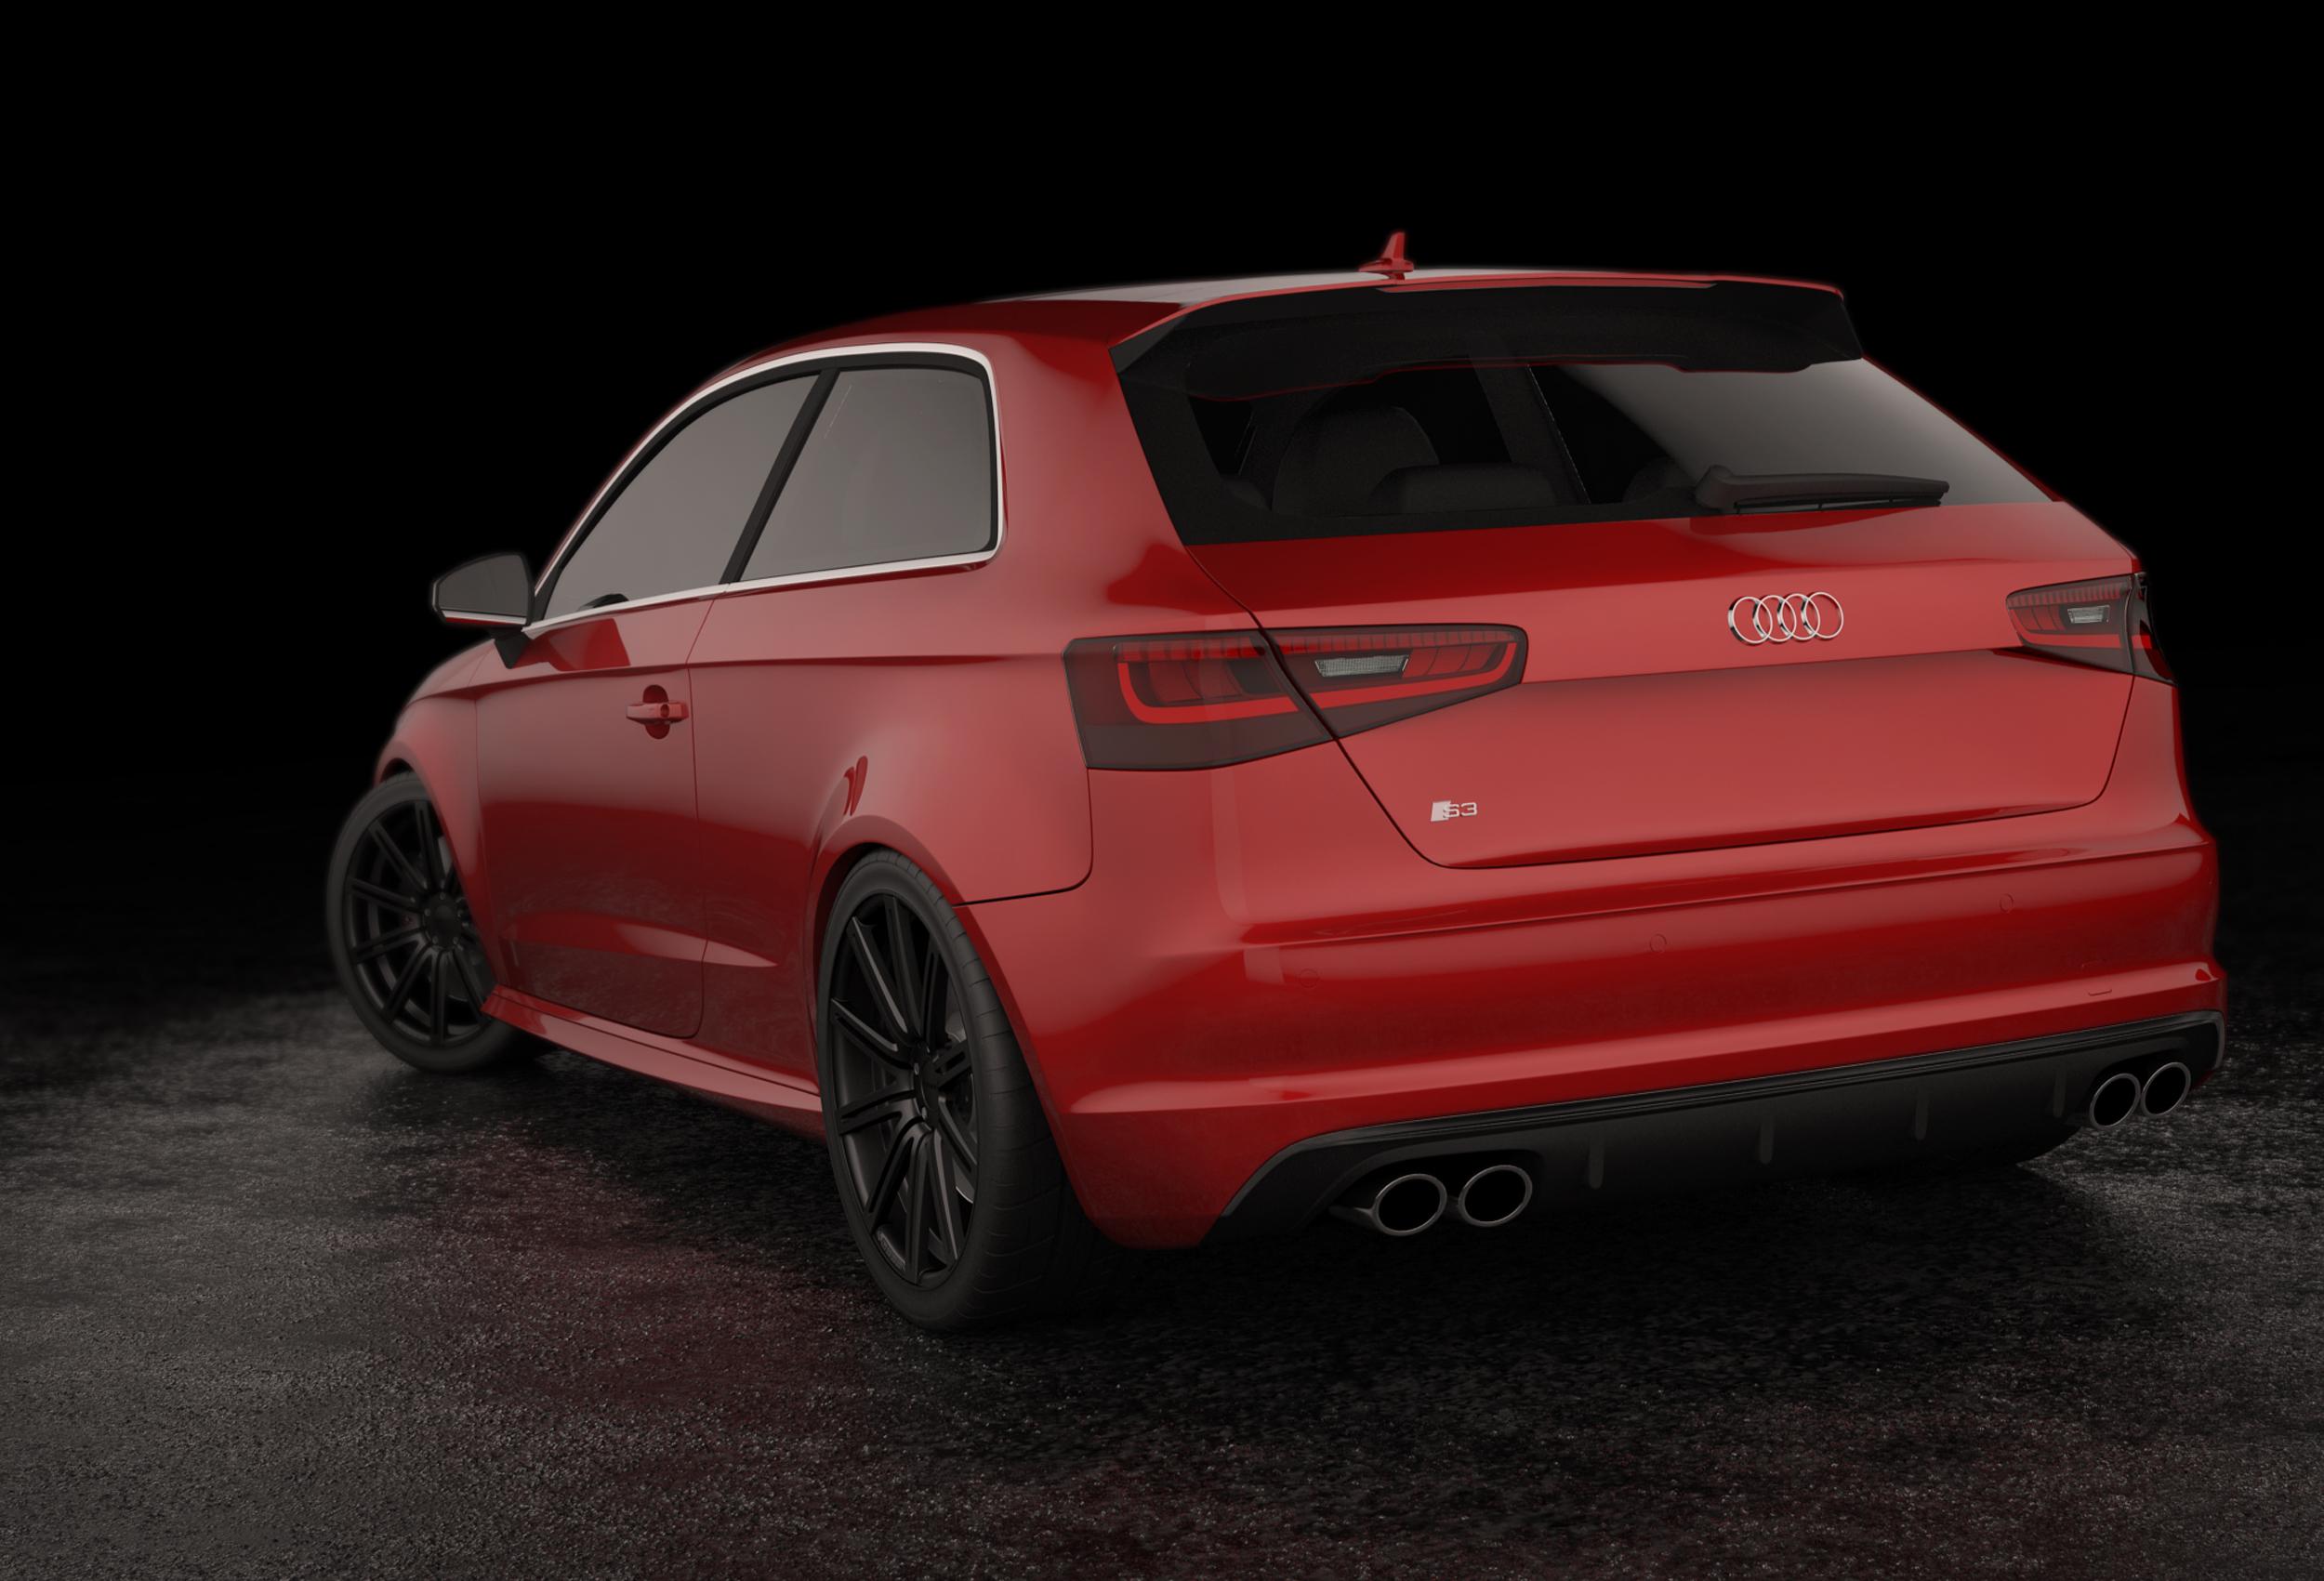 Modélisation Audi S3 Par Dripmoon